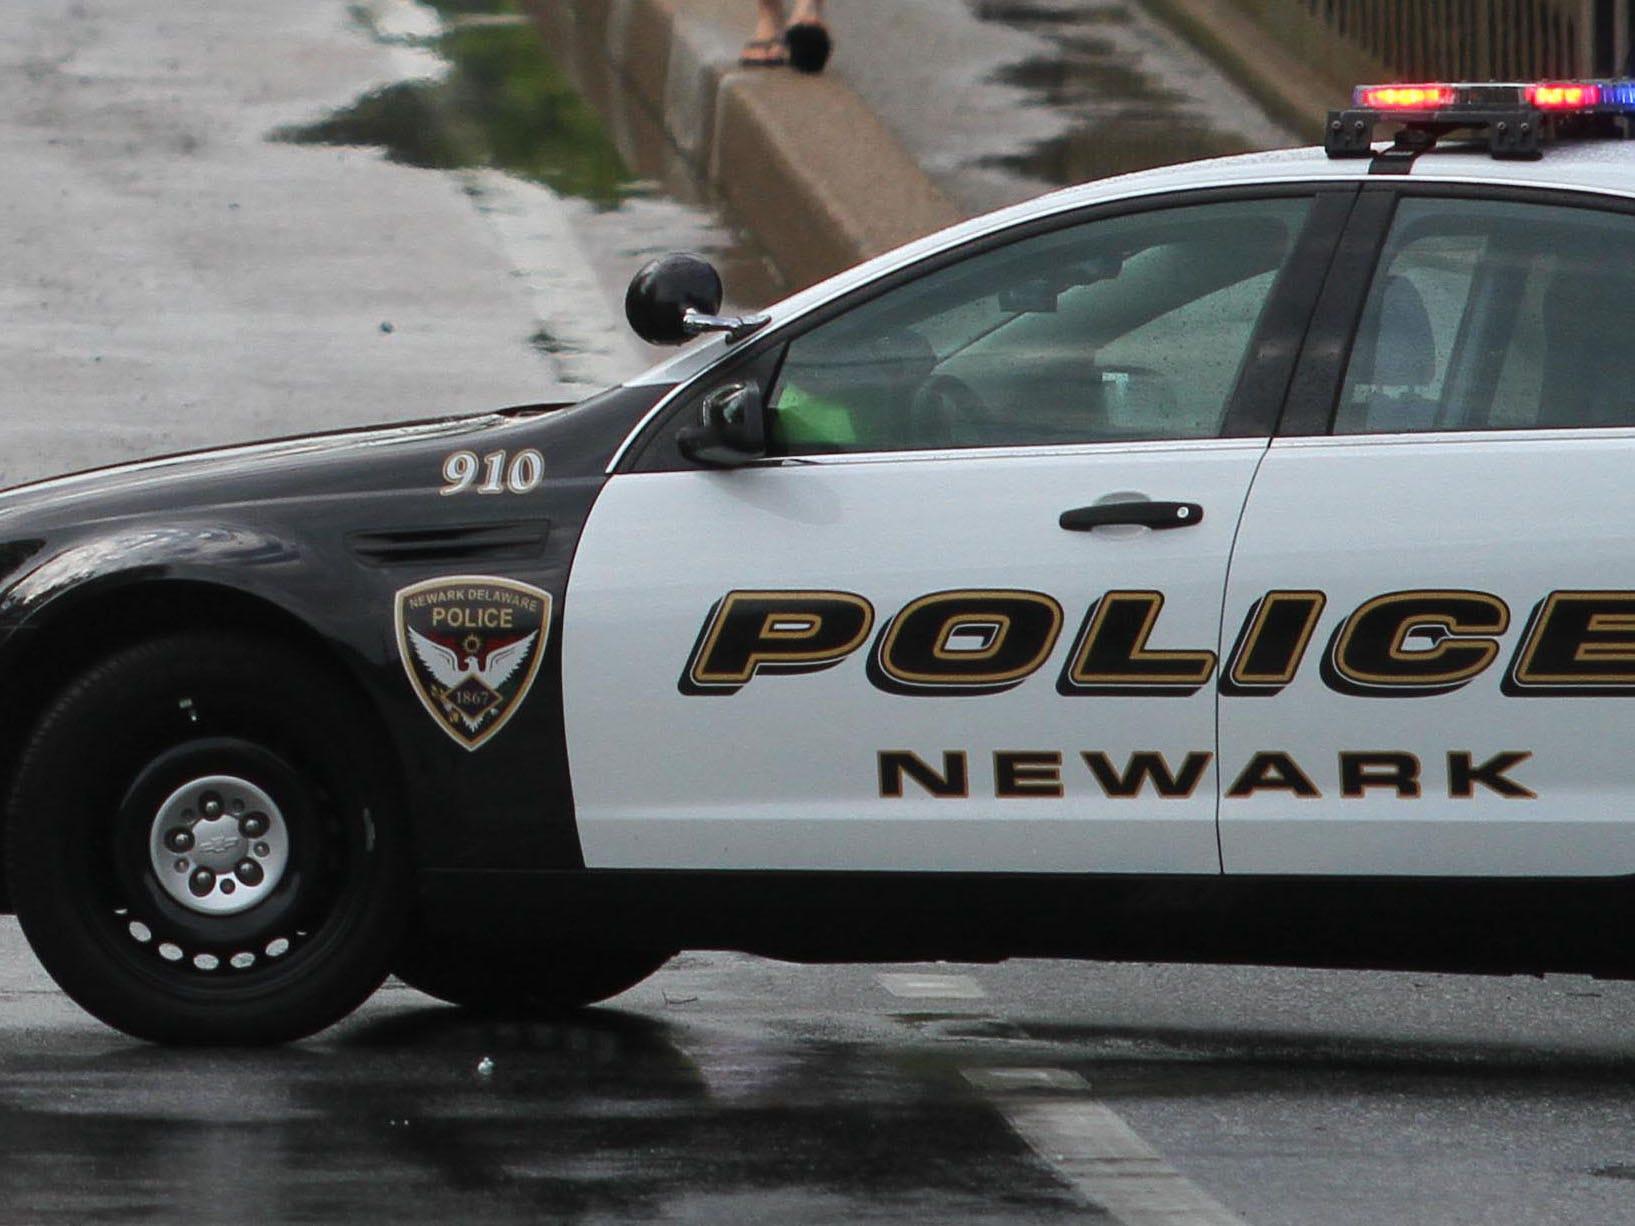 Fatal crash in Newark involving a motorcycle under investigation, police say